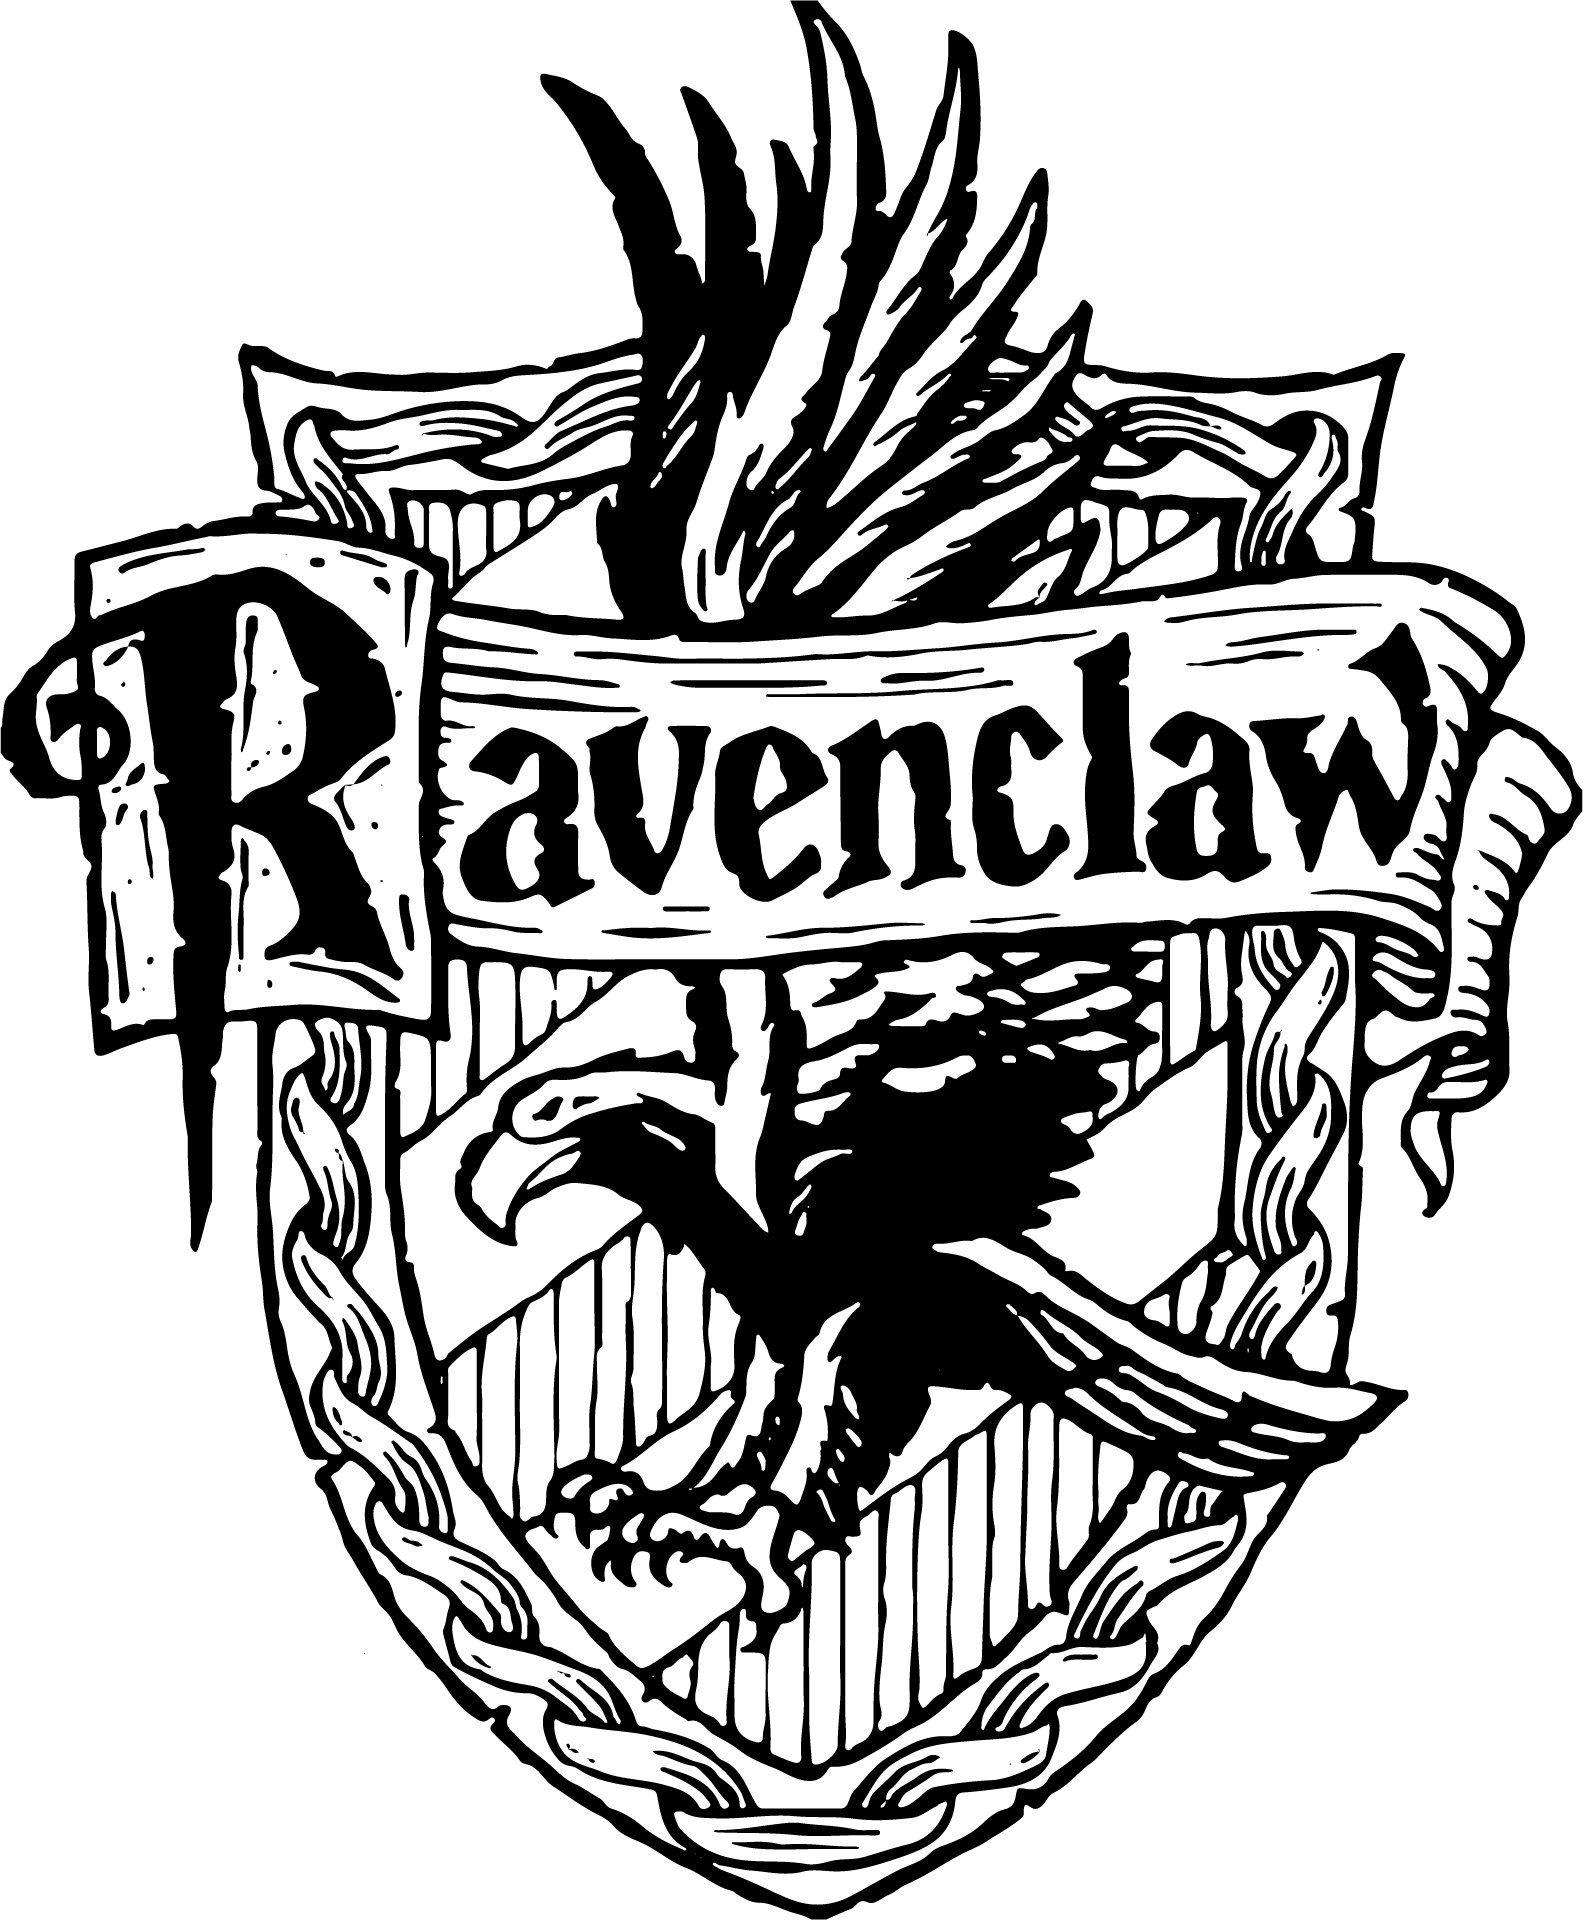 harry potter badge coloring pages | Ravenclaw Harry Potter SVG badge for cricut, digital ...